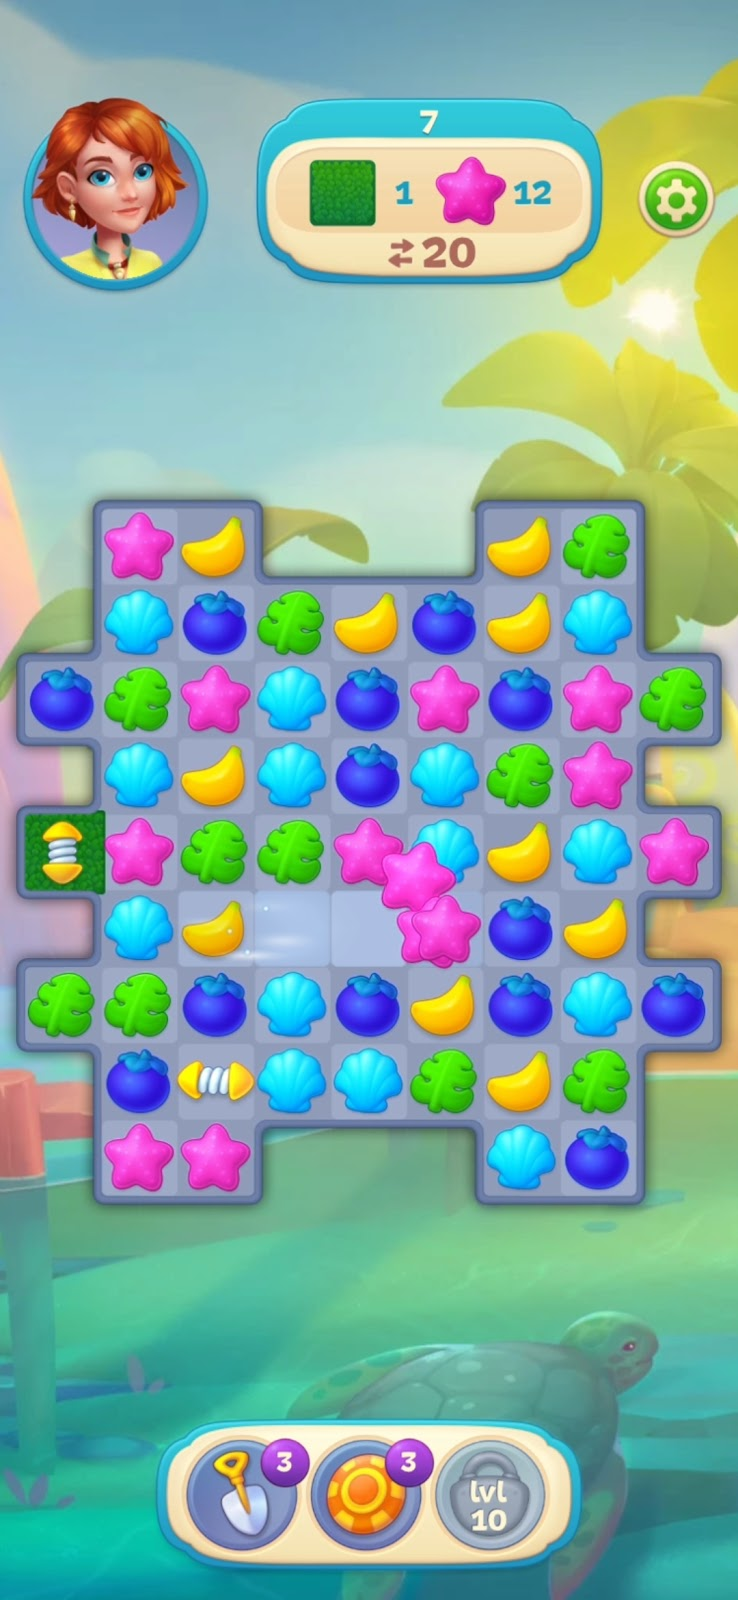 hawaii-match-3-g5-entertainment-game-reviews